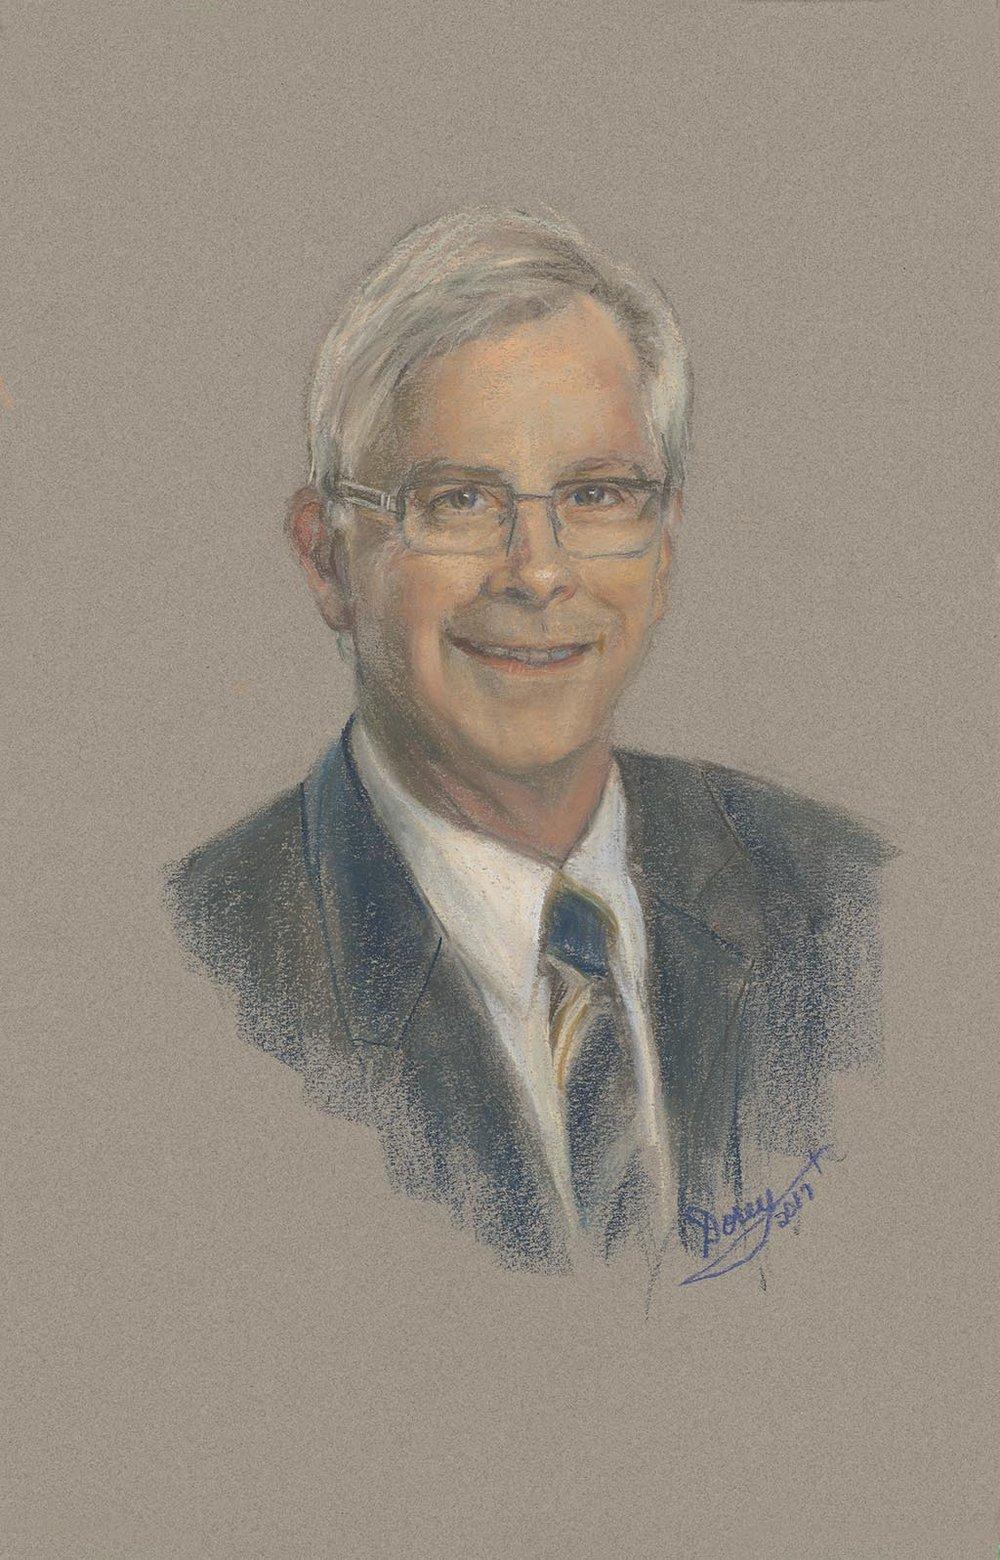 Jim Eisenhauer